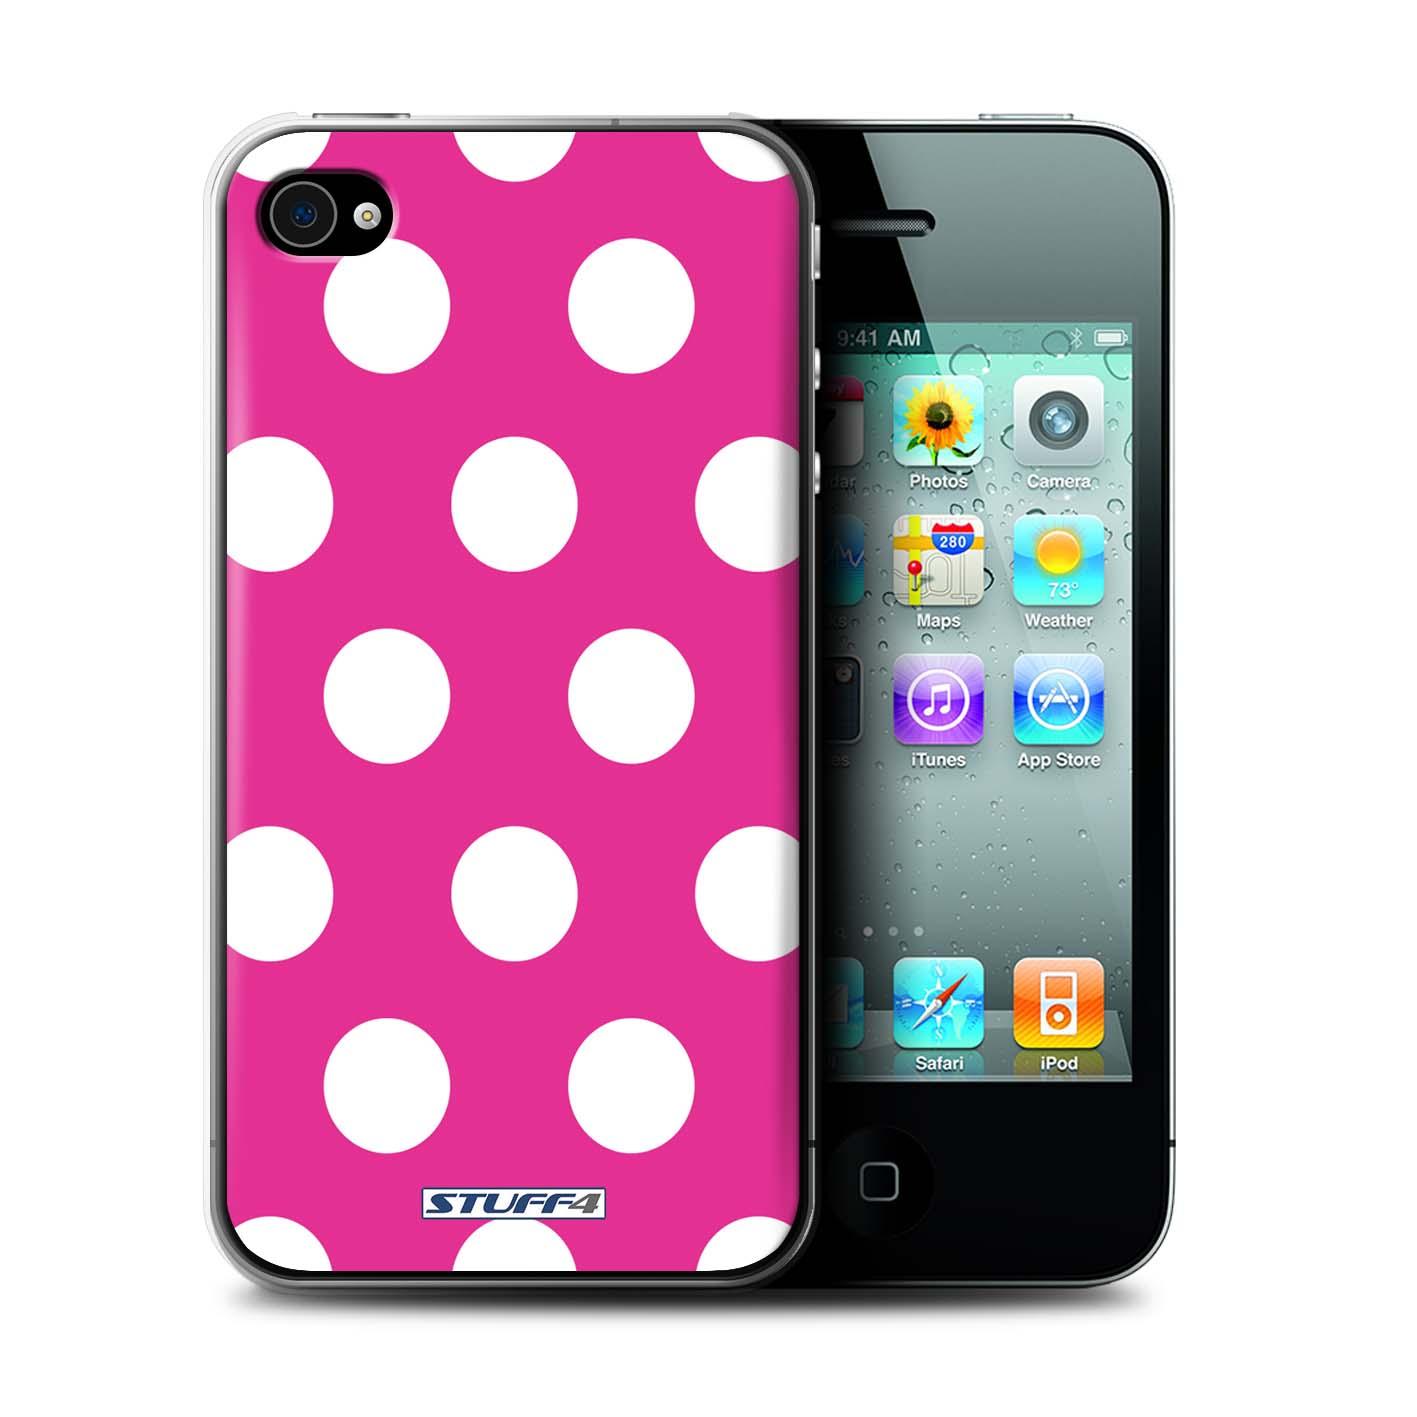 STUFF4-Coque-Etui-pour-Apple-iPhone-Smartphone-Motif-a-Pois-Protection-Housse